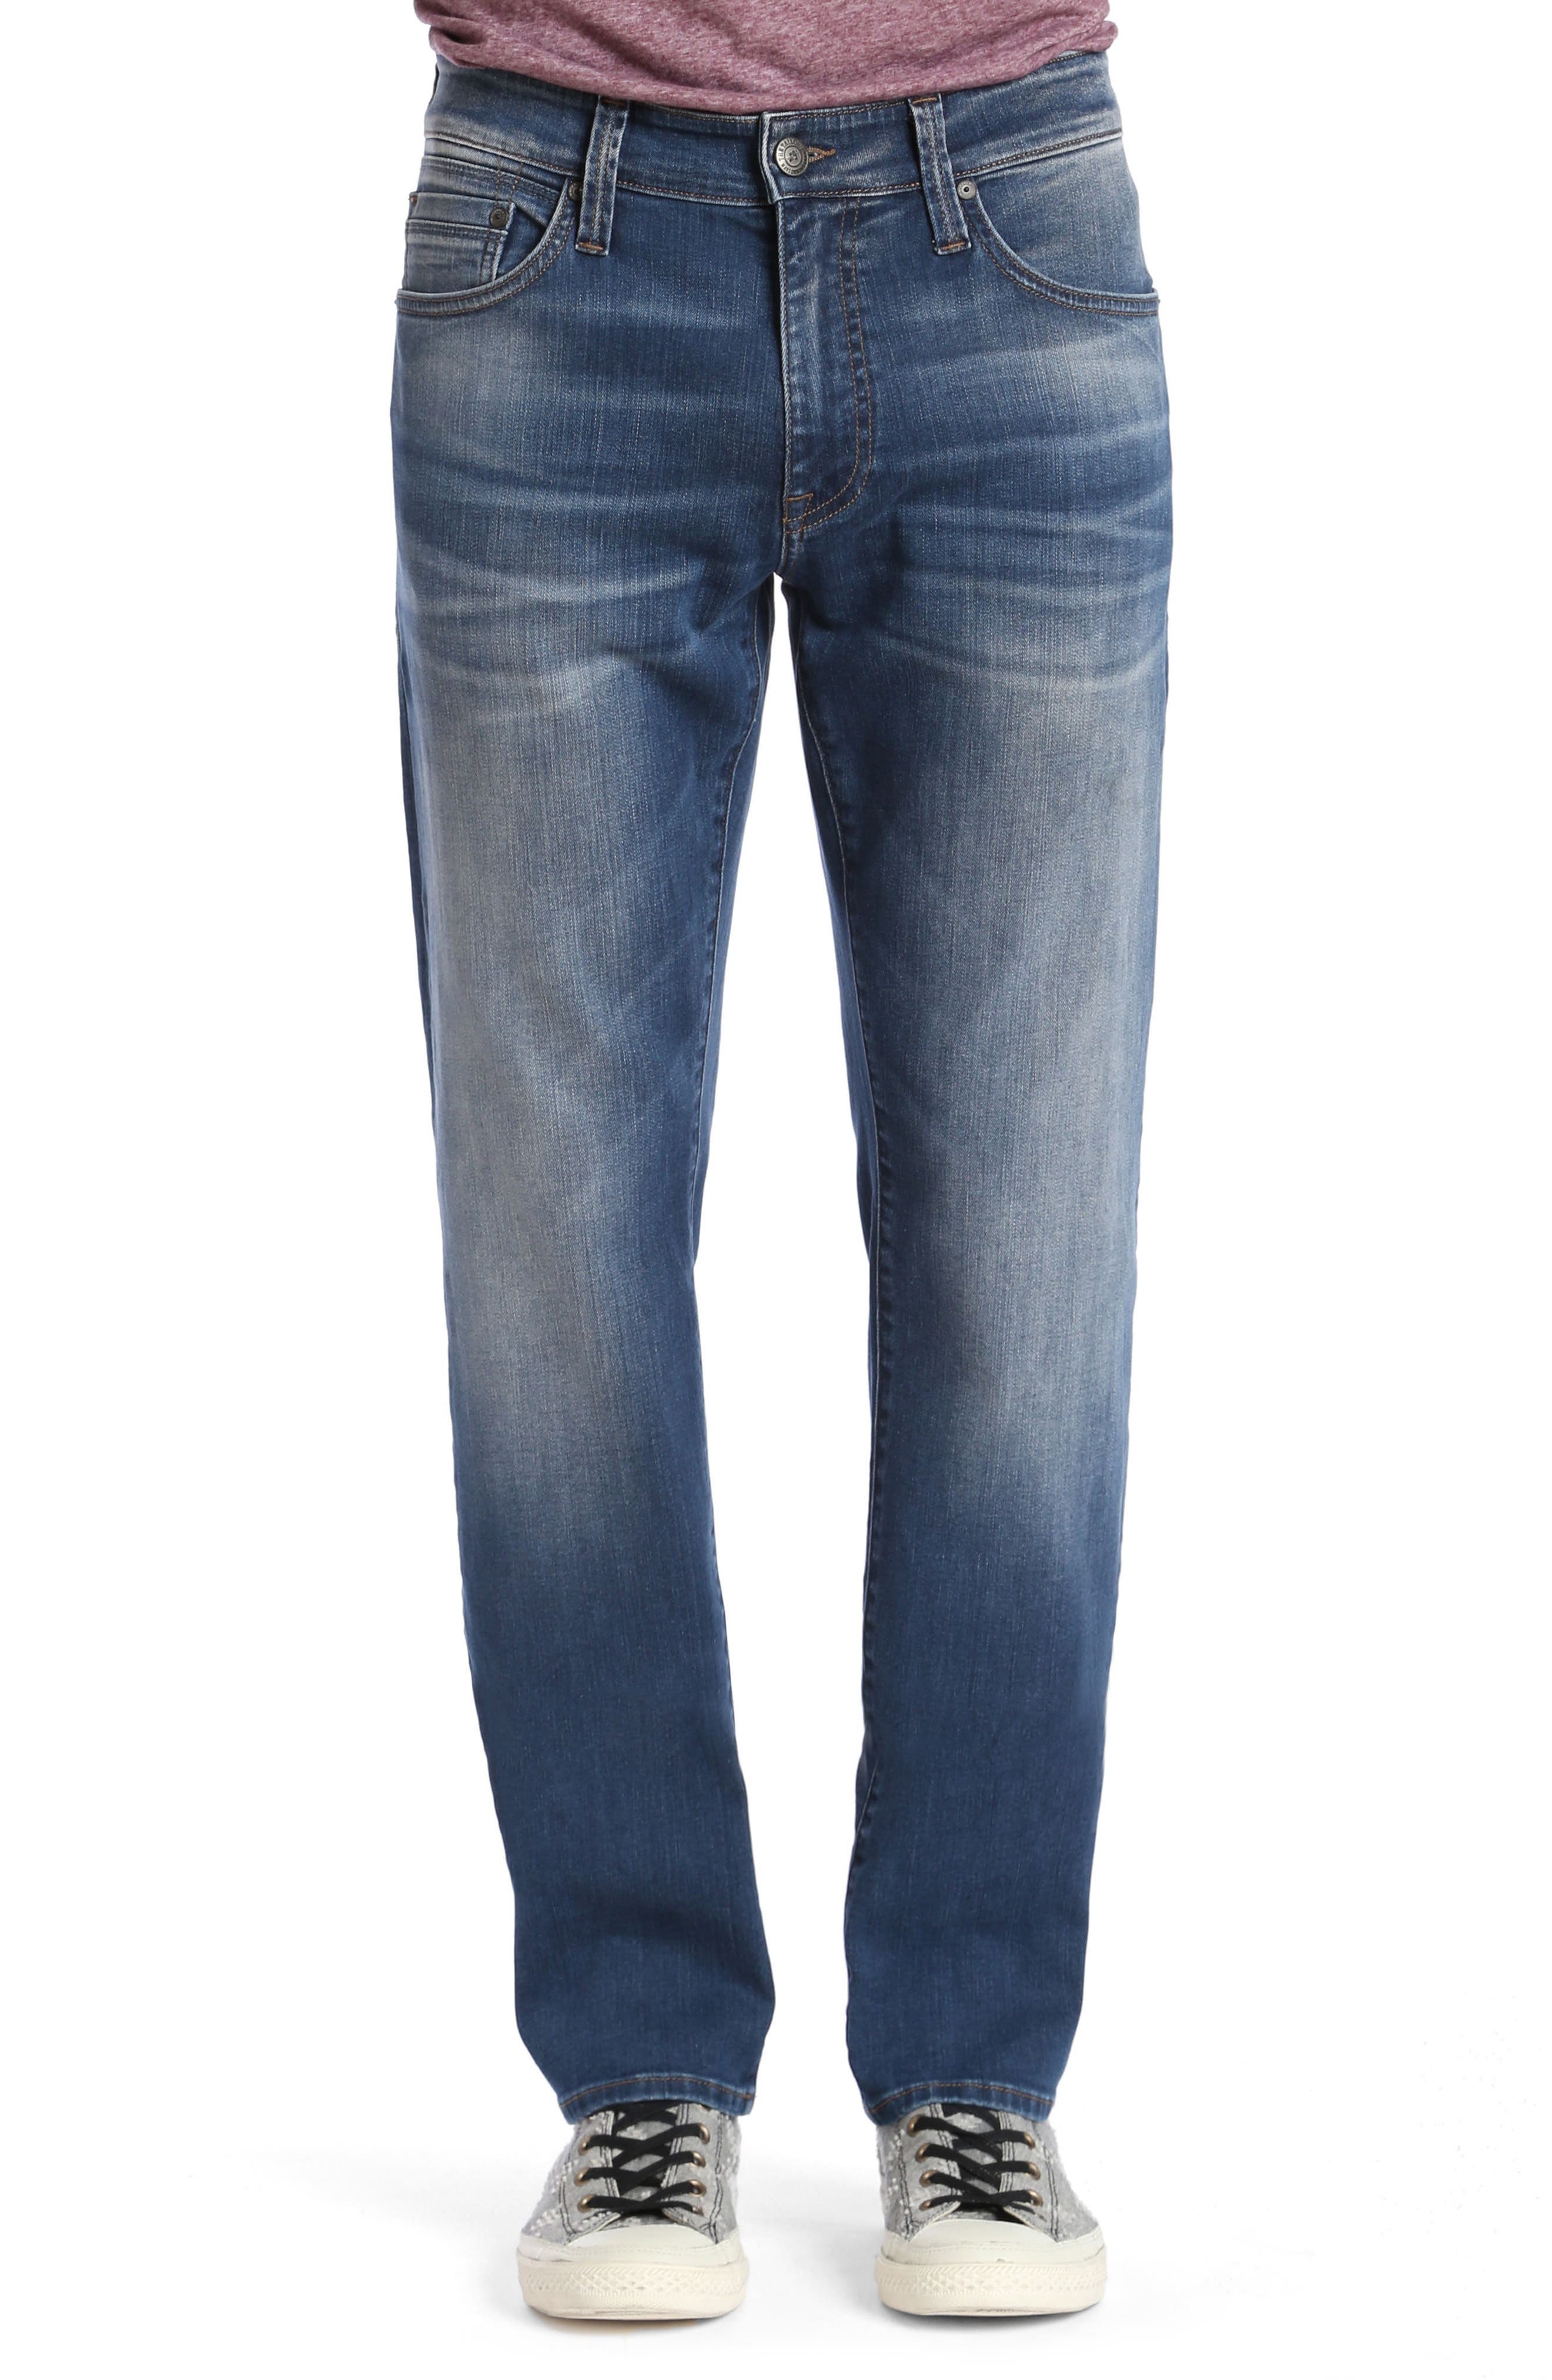 Main Image - Mavi Jeans Zach Straight Fit Jeans (Mid Shaded Williamsburg)